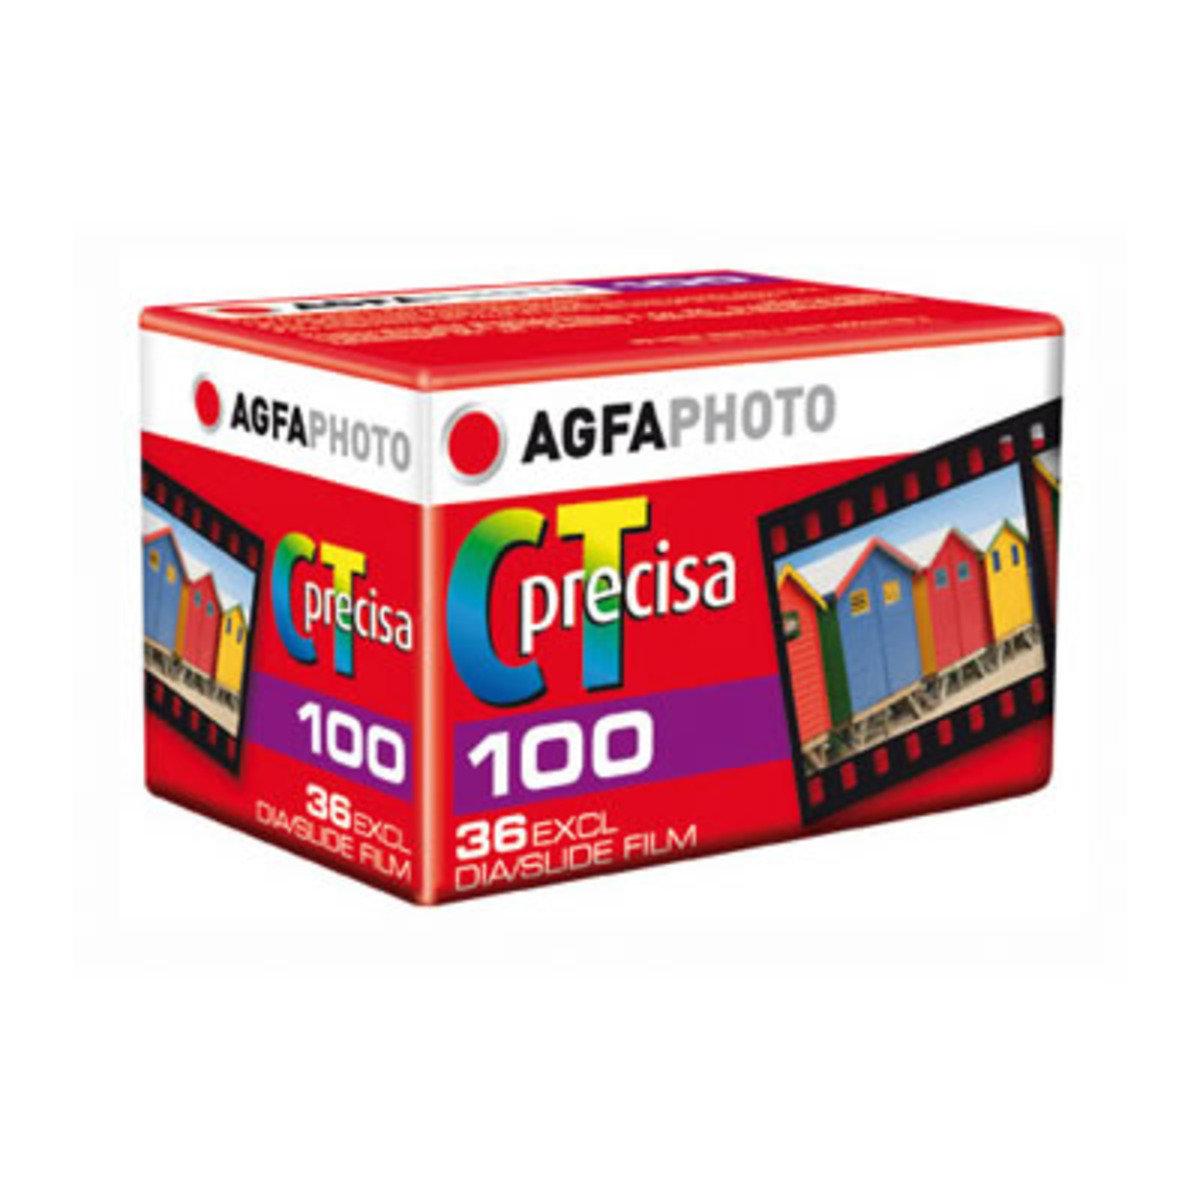 AgfaPHOTO CT Precisa 100 135-36